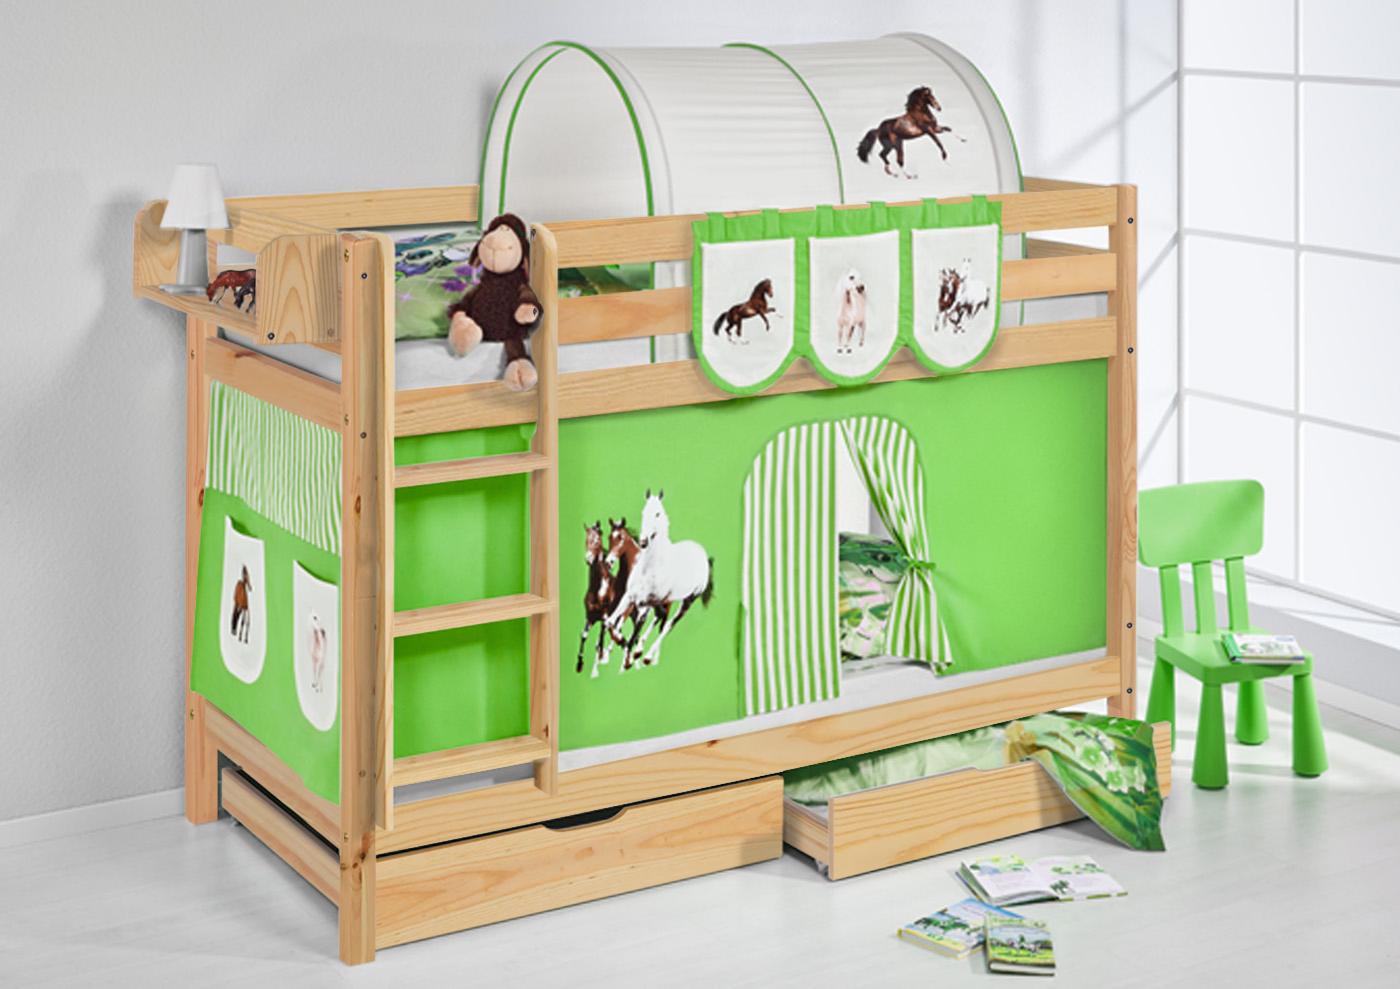 etagenbett hochbett kinder bett aus massiver kiefer jelle On etagenbett kinderbett